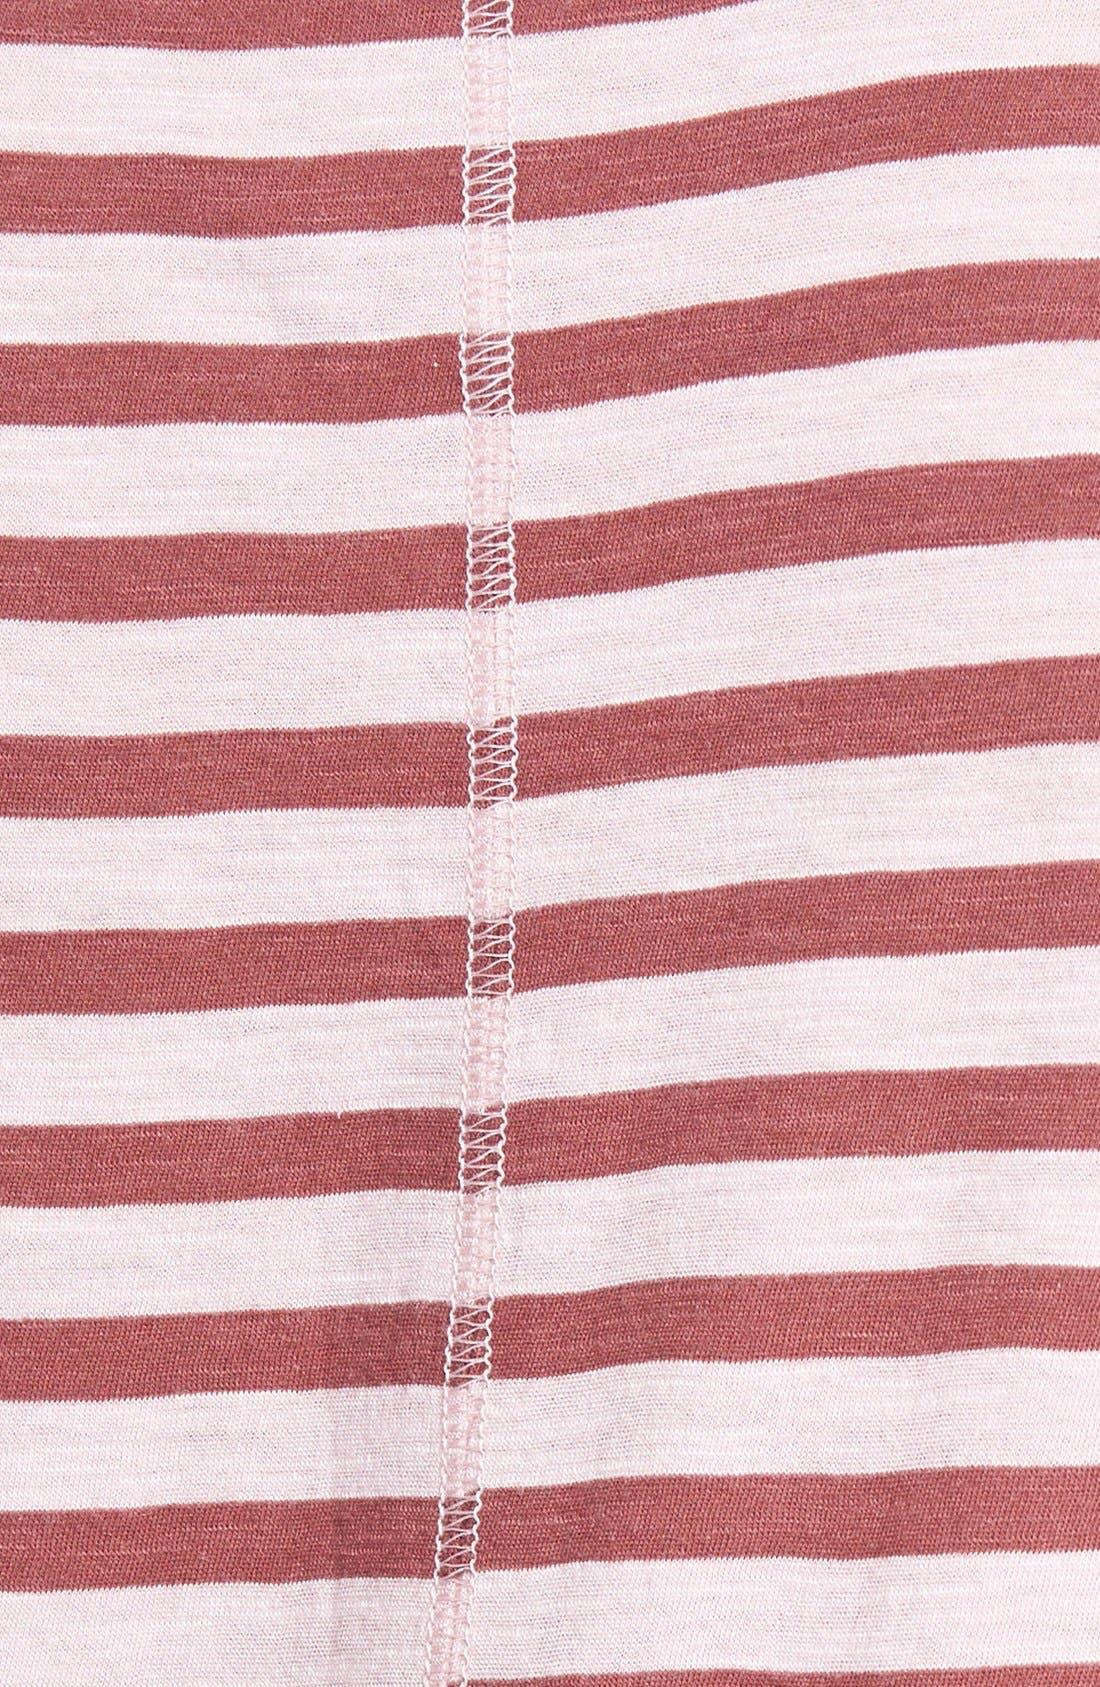 Short Sleeve Cotton & Modal Tee,                             Alternate thumbnail 47, color,